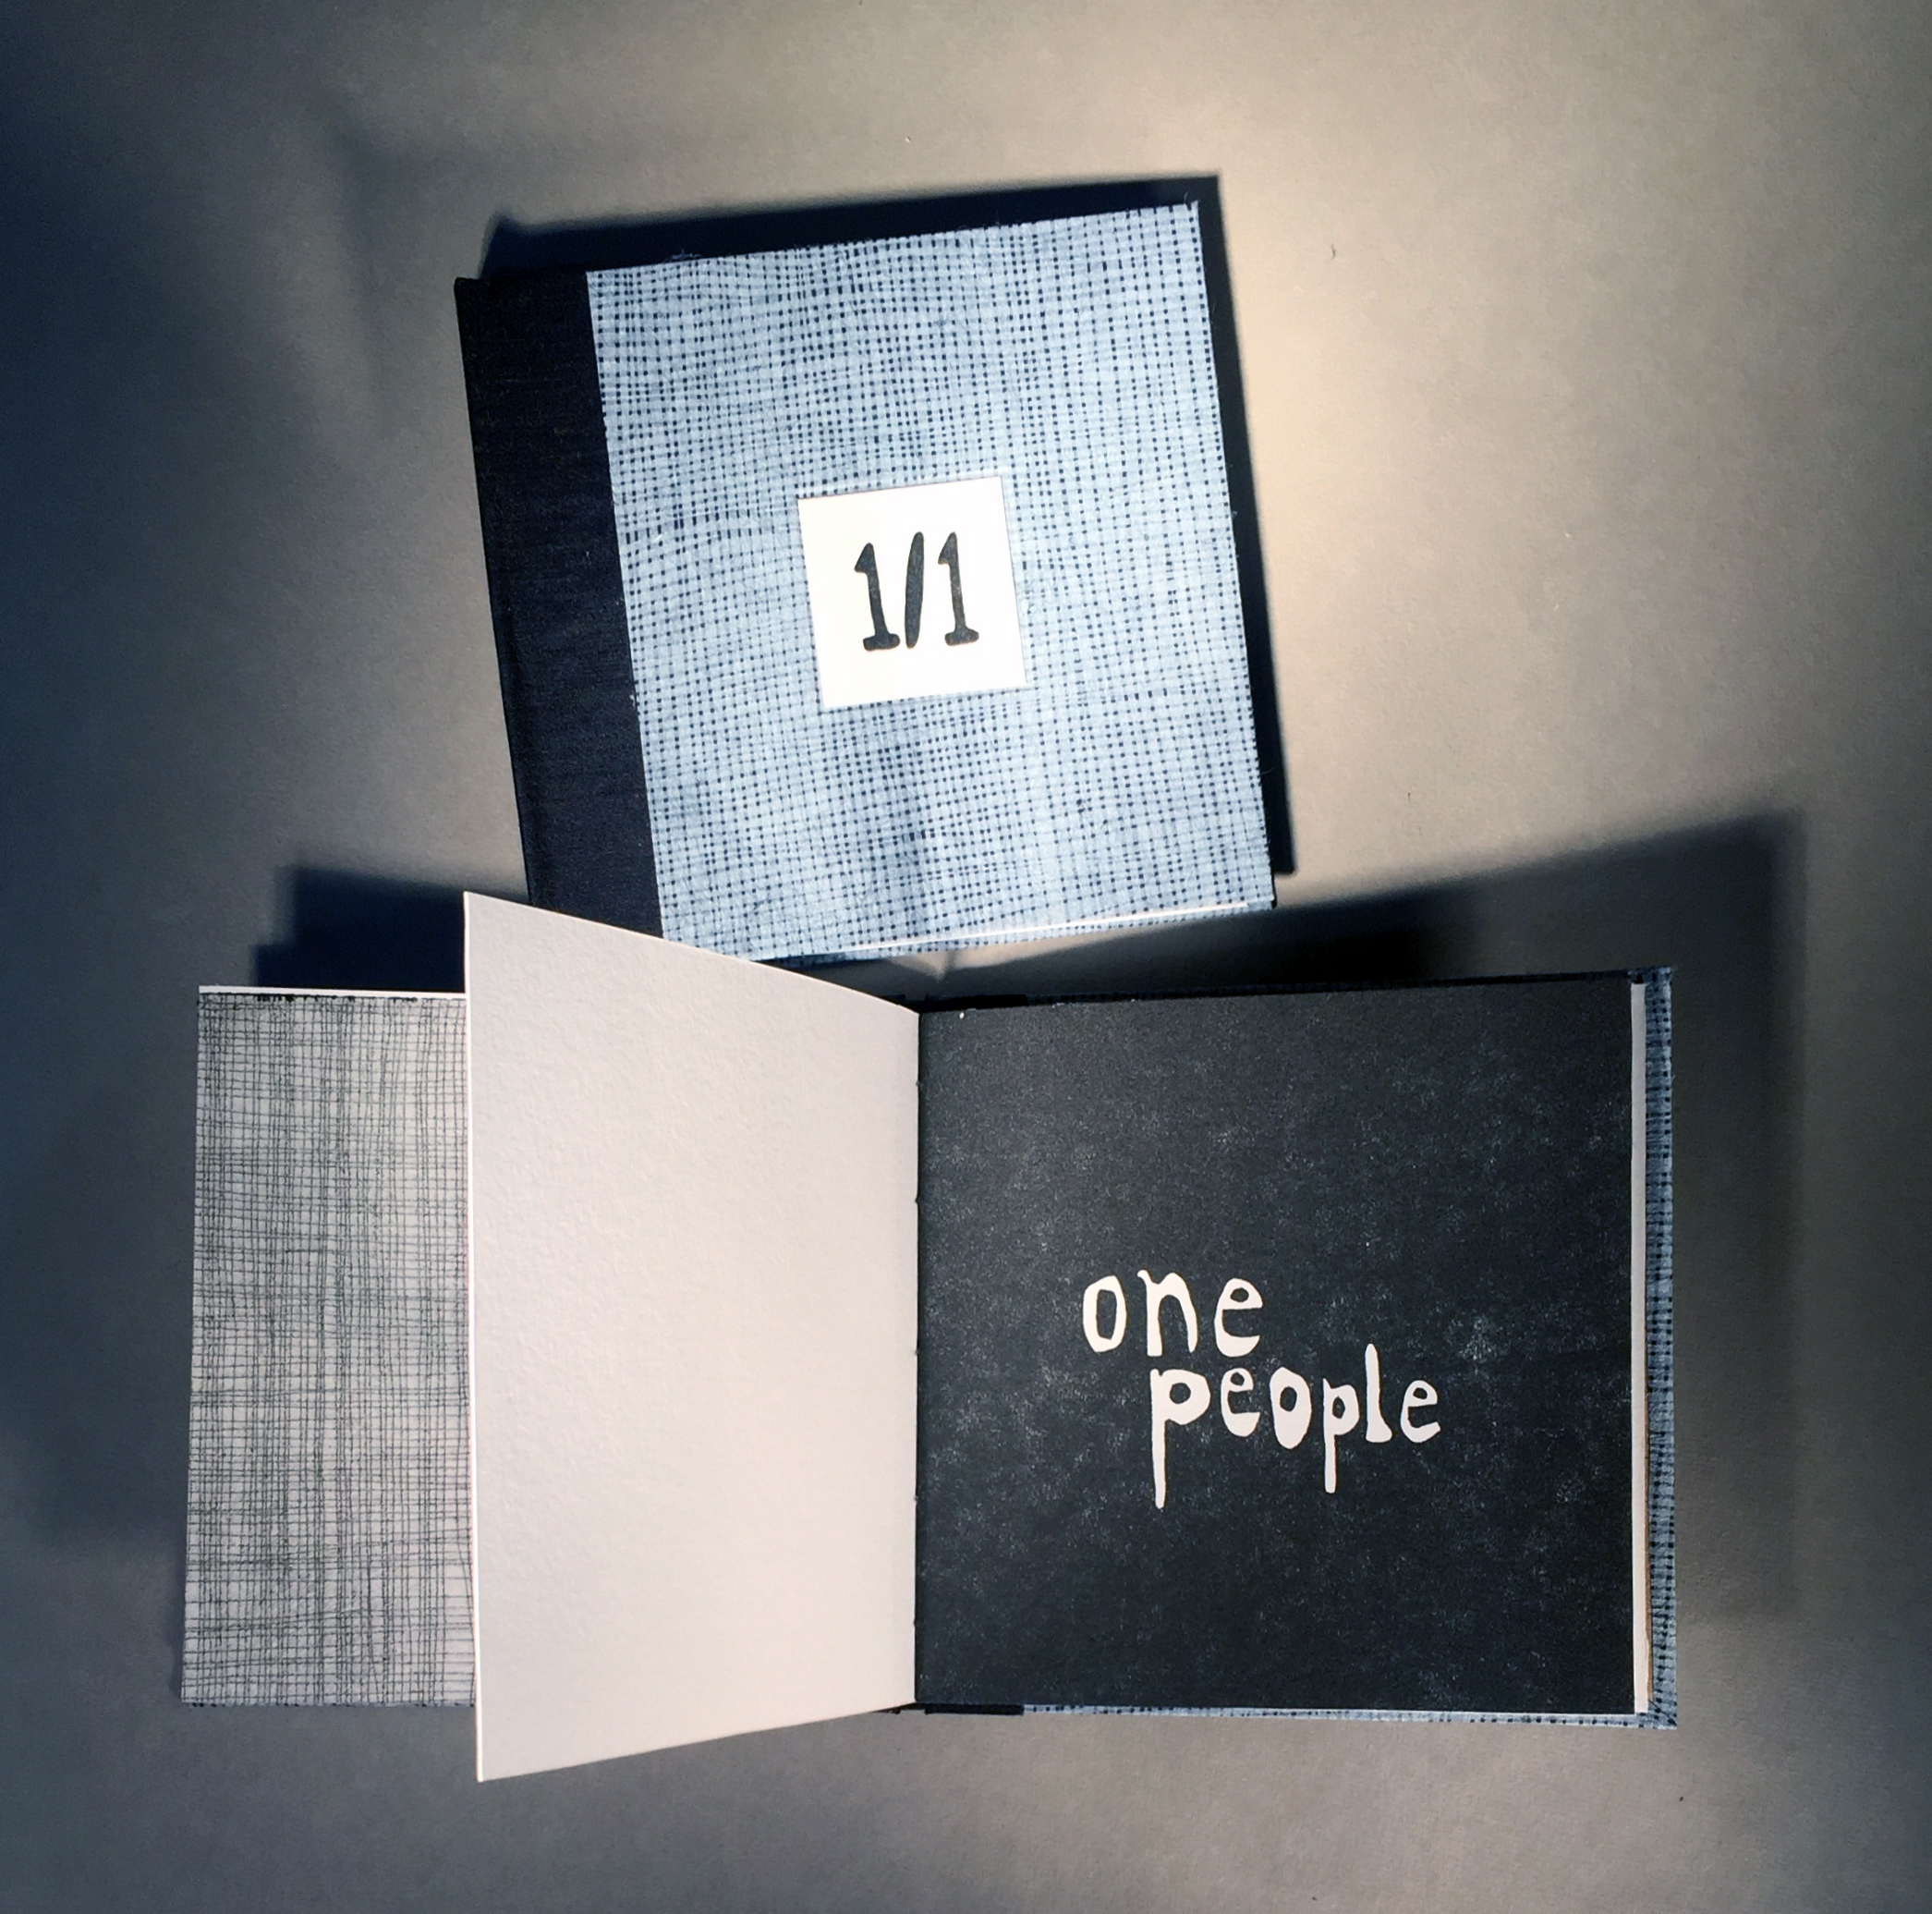 1over1-one-people.jpg